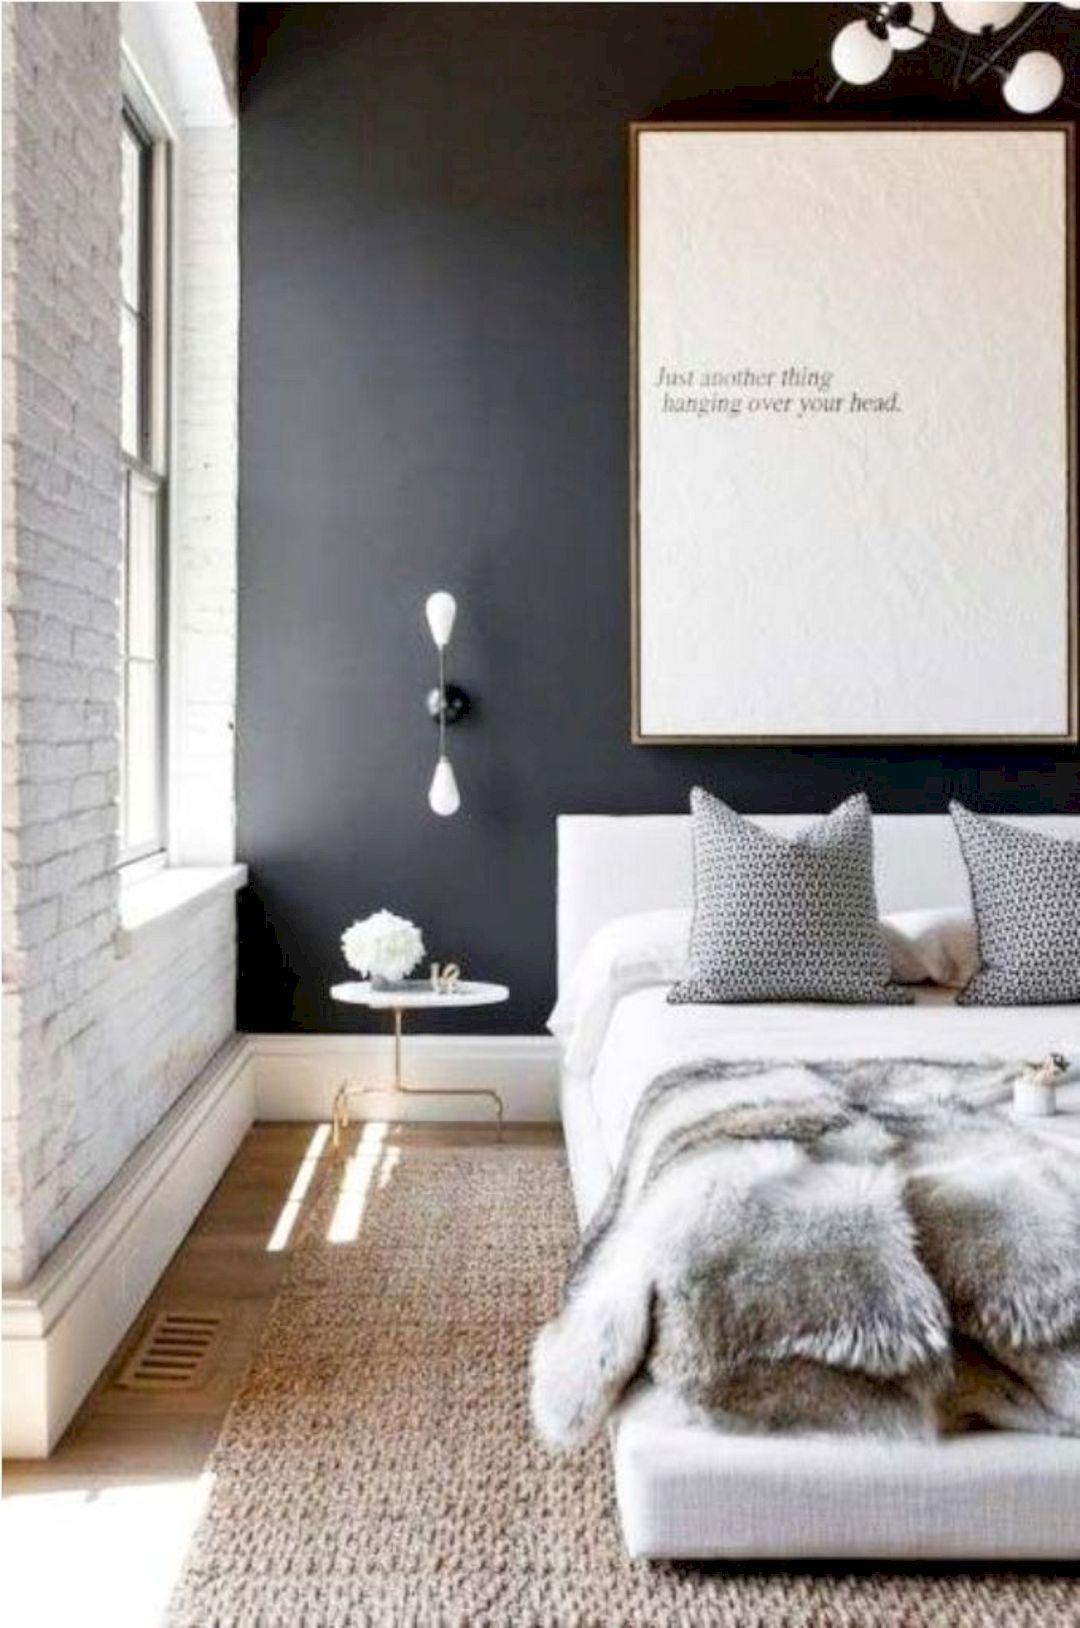 Superieur 16 Cool Bedroom Interior Design Ideas  Https://www.futuristarchitecture.com/30612 Bedroom Interior Design Ideas. Html